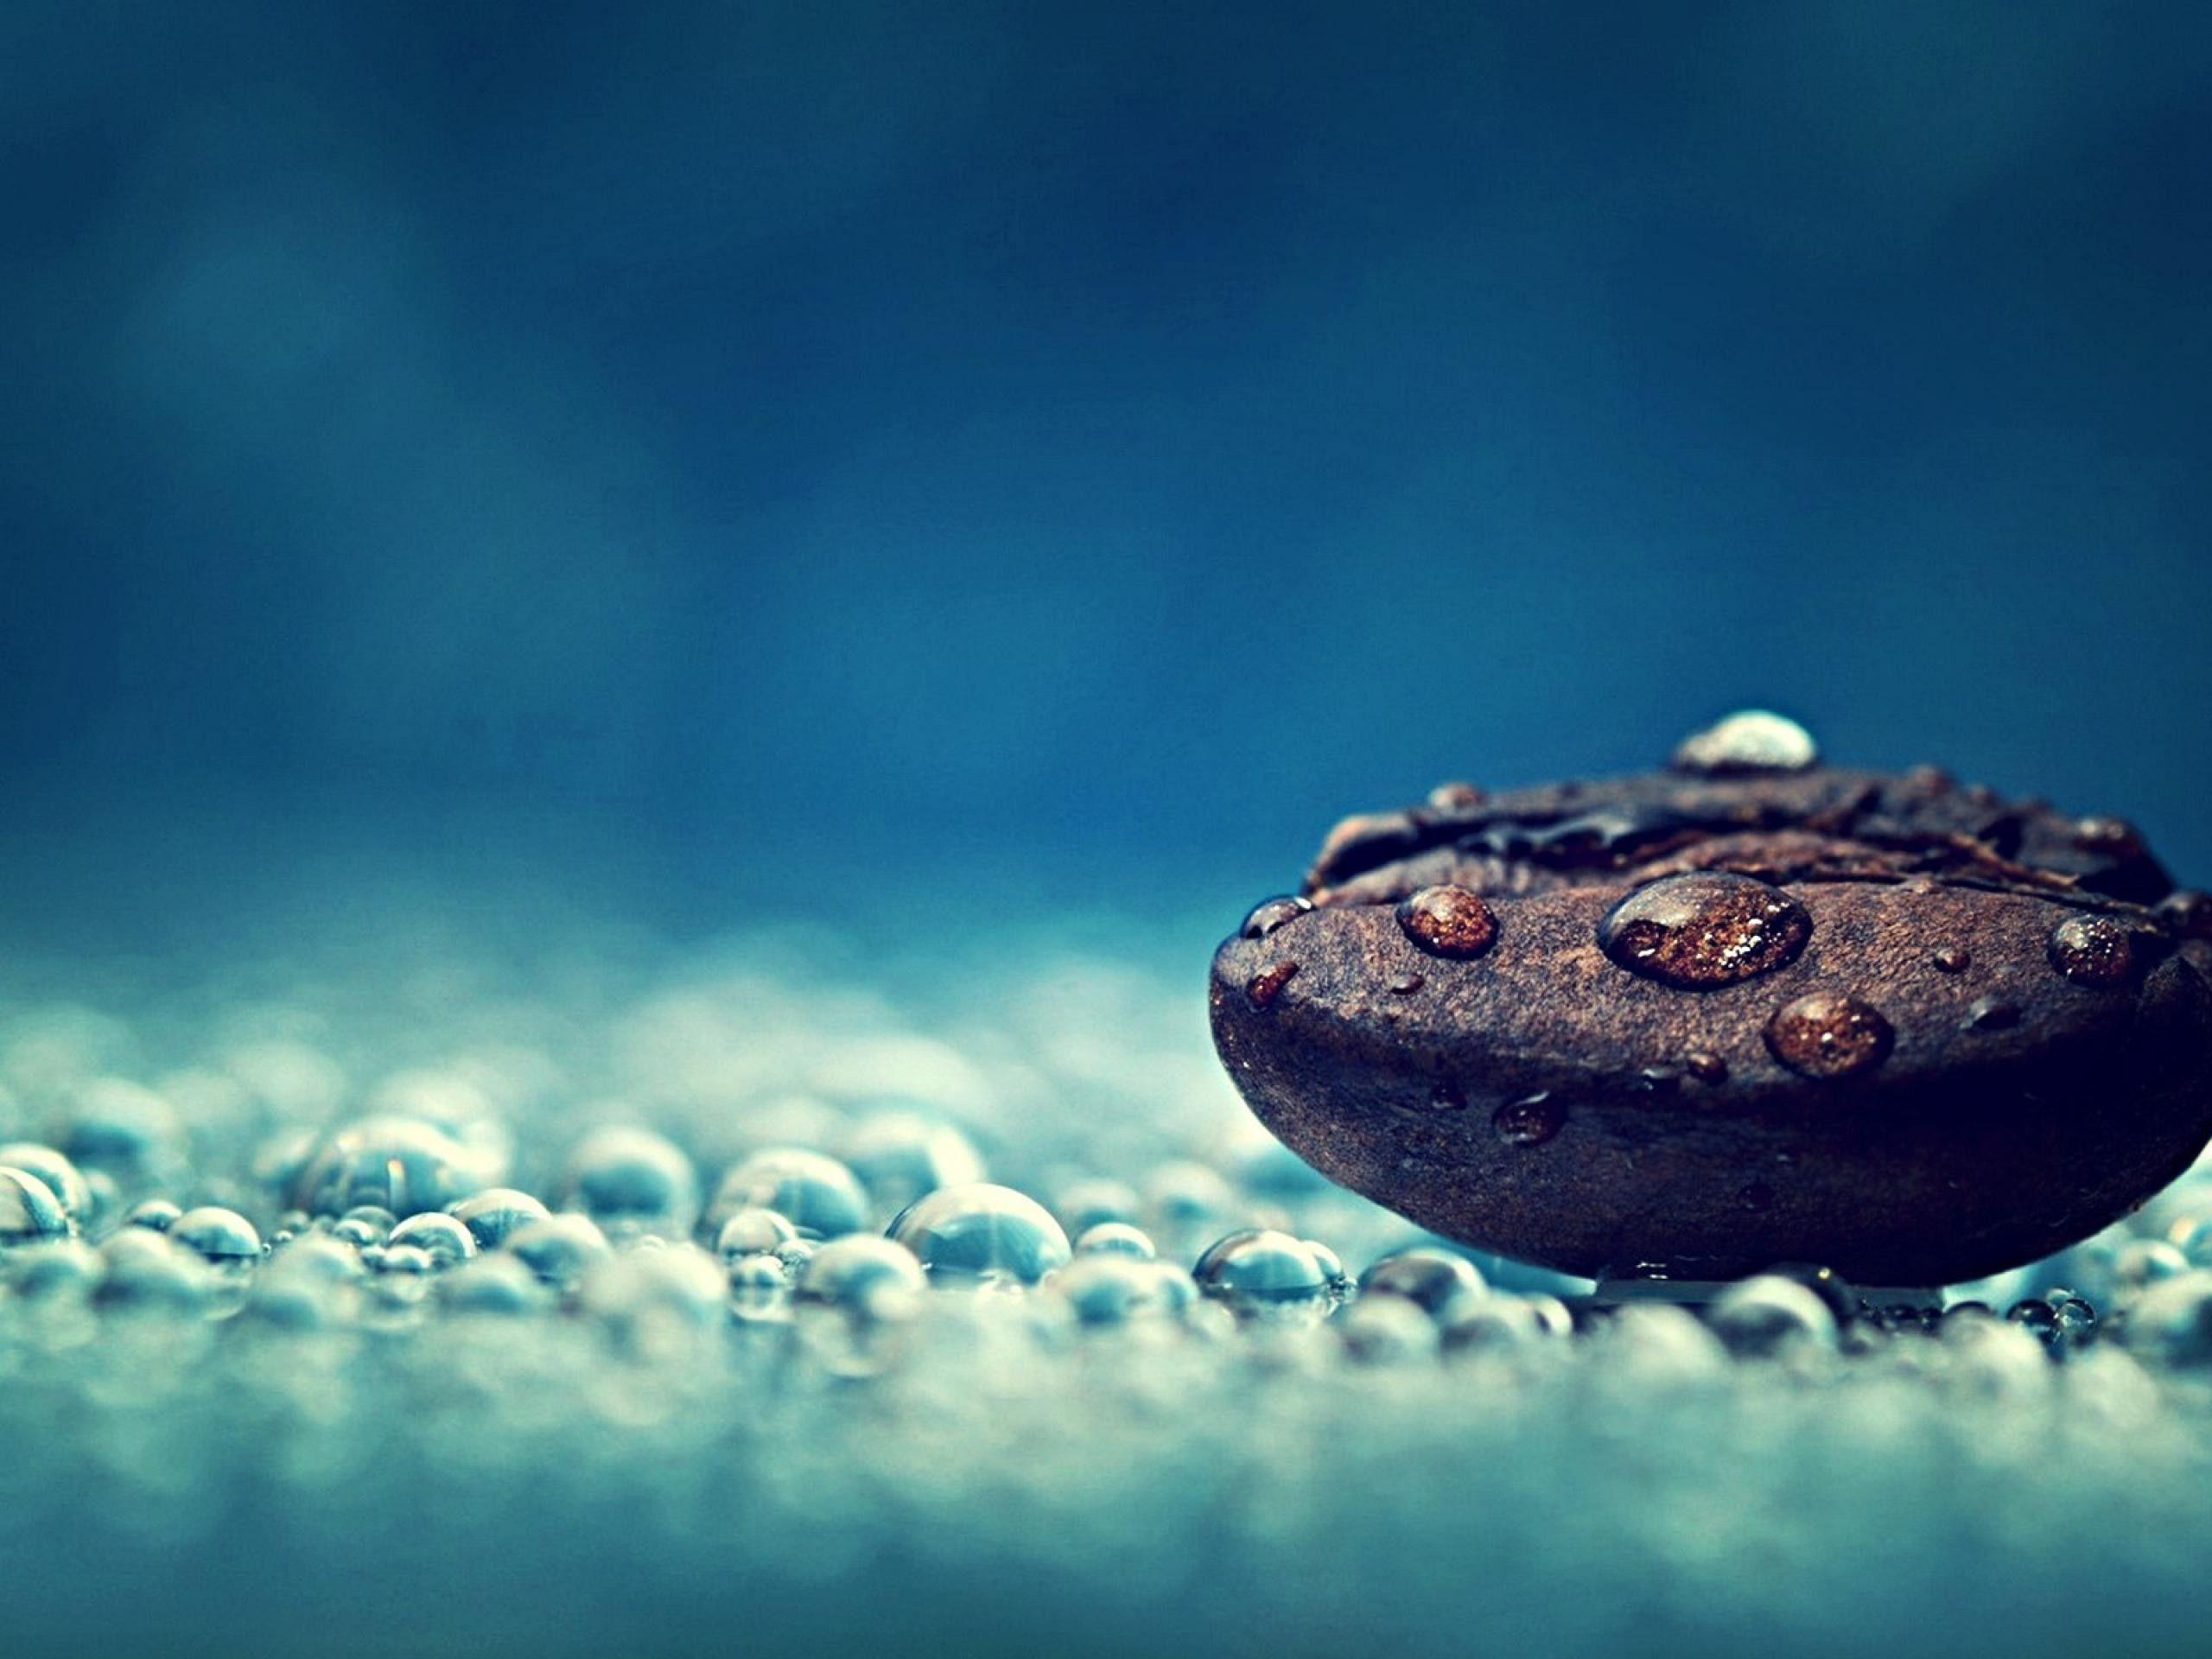 Nature Photography Water Drops Macro Photography Wallpaper